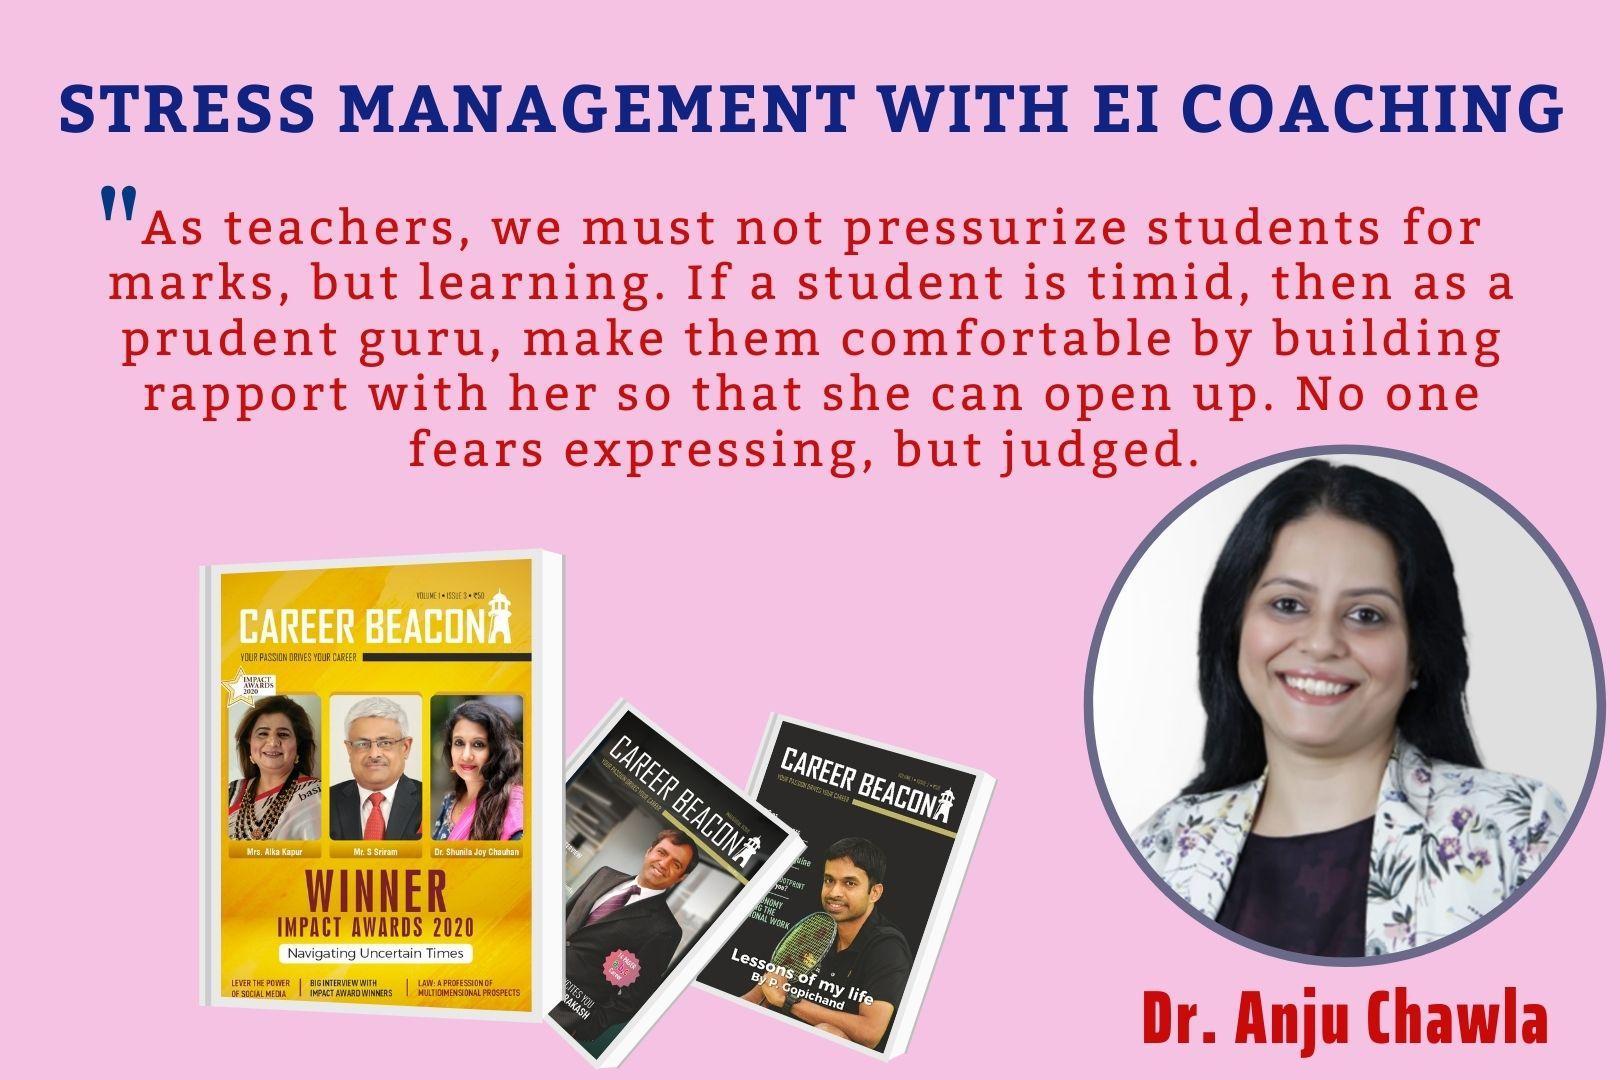 STRESS MANAGEMENT WITH EI COACHING